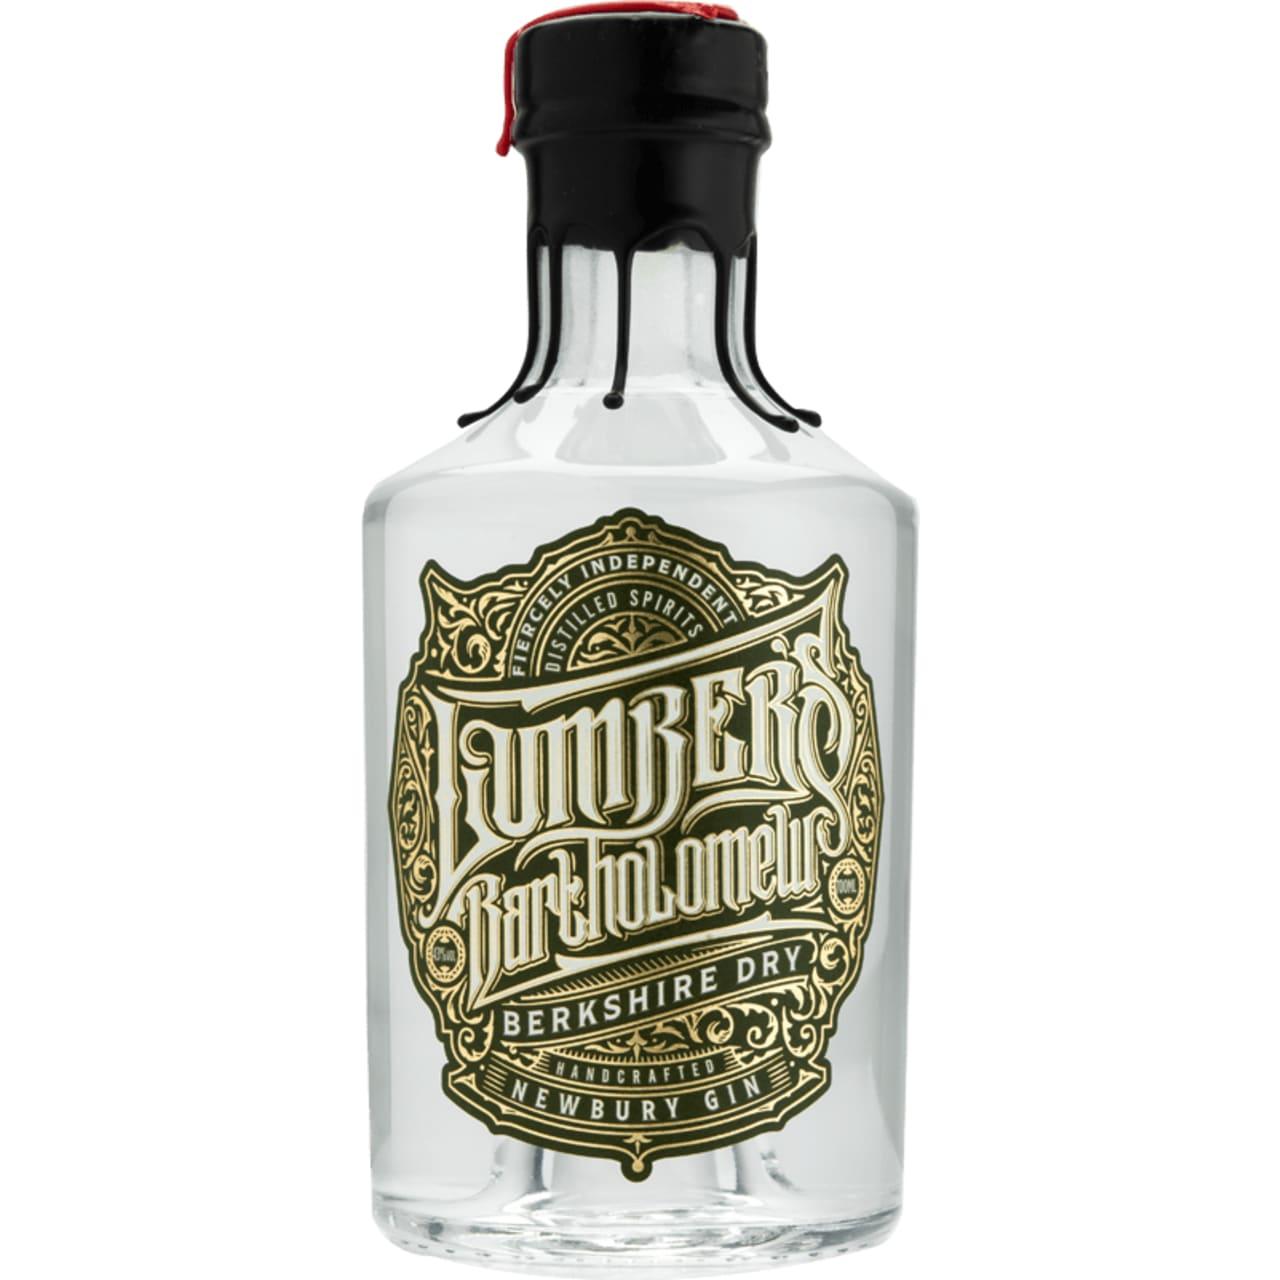 Product Image - Lumbers Bartholomew Berkshire Dry Gin